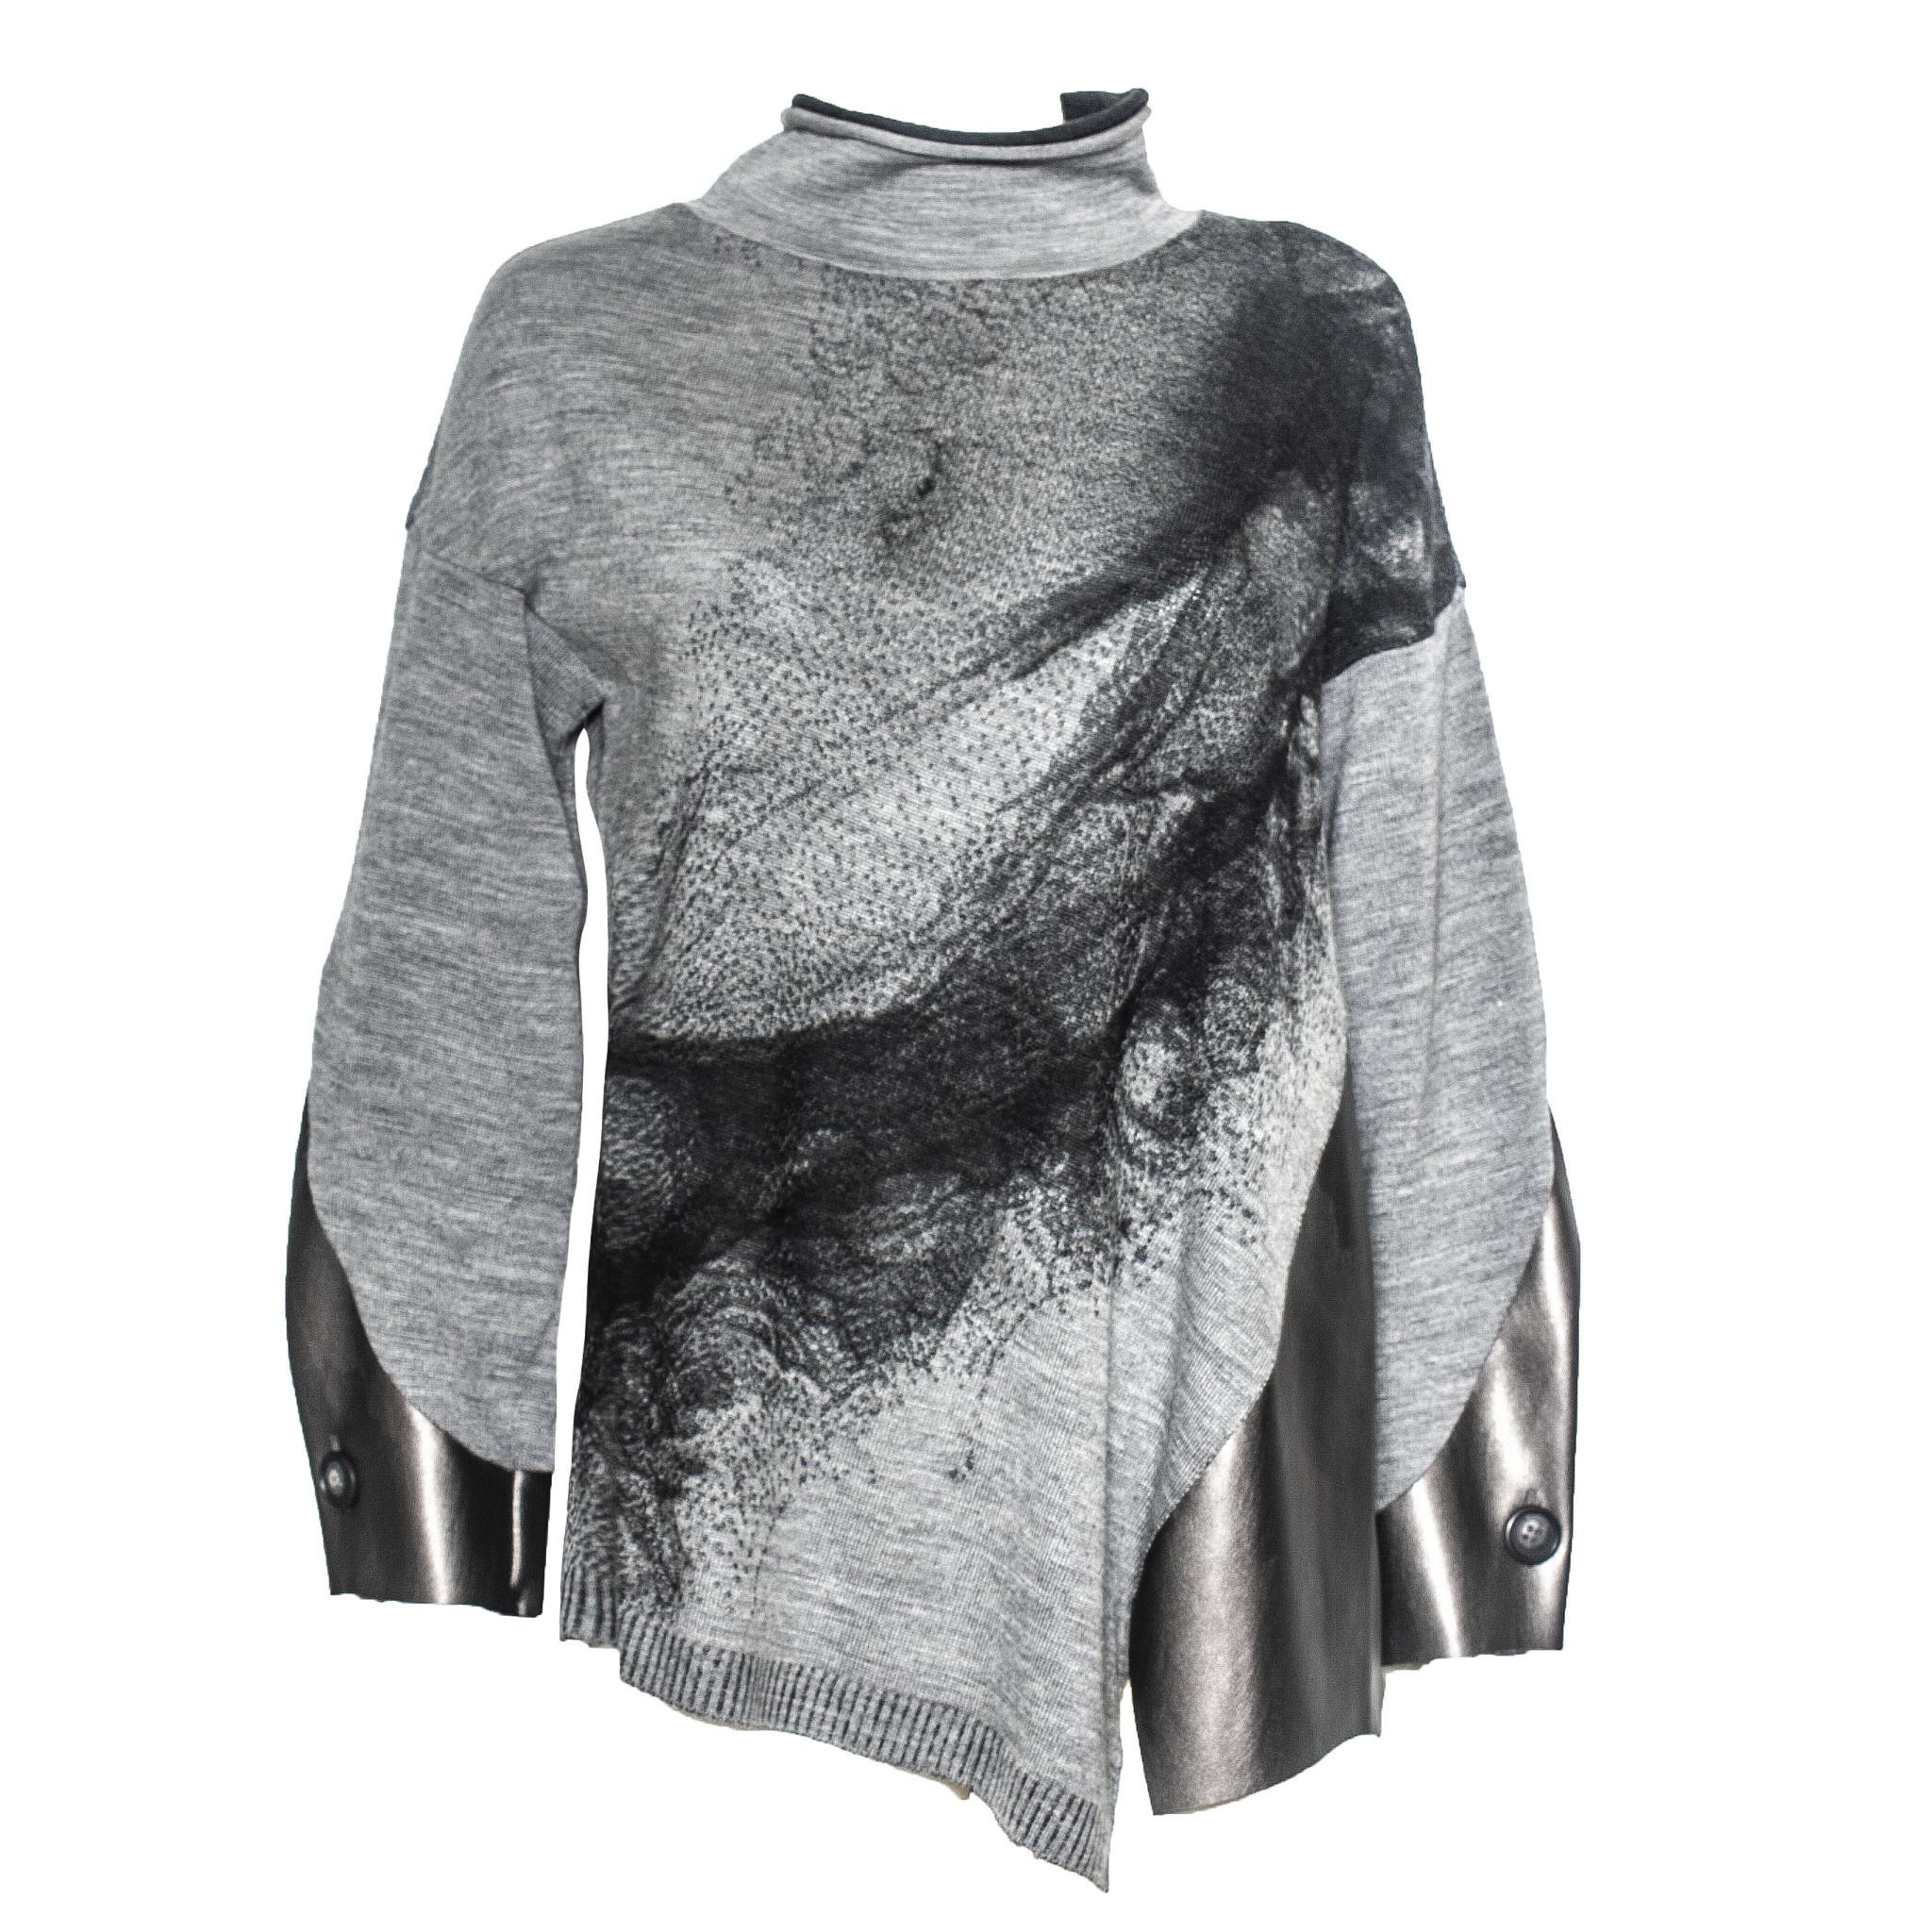 Yoshi Yoshi Yoshi Yoshi Pullover with Synthetic Leather - Grey/Black